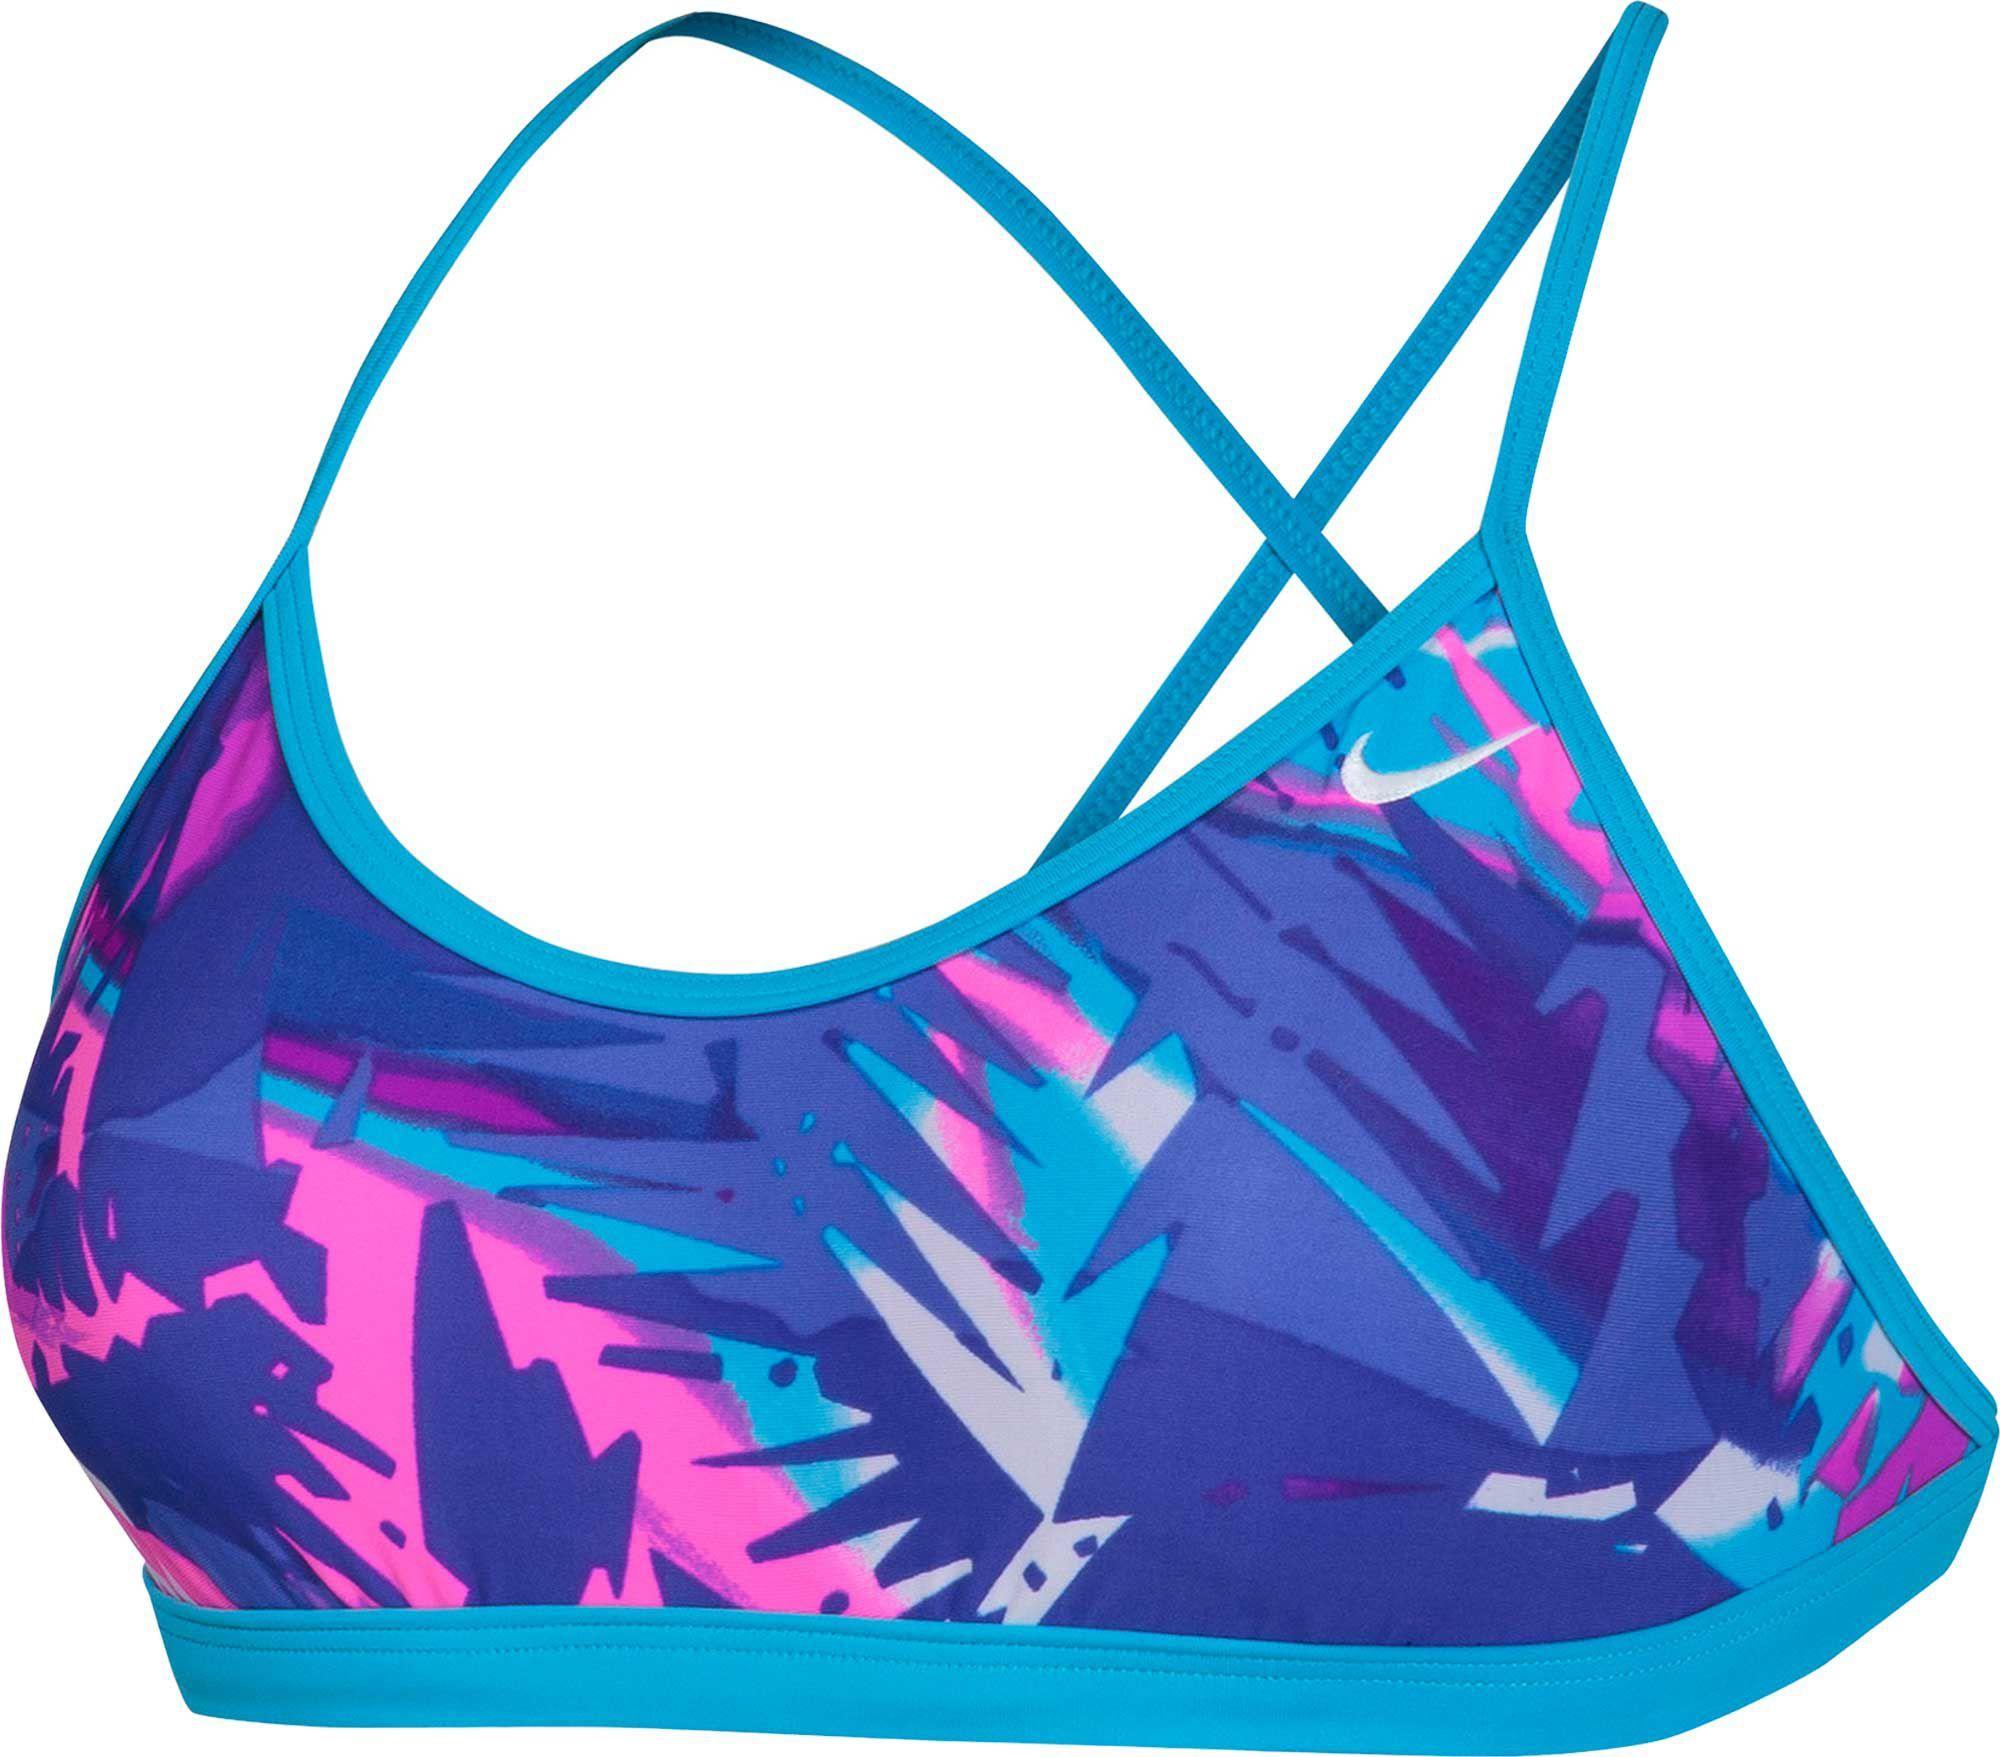 ff6b3e30 Nike Women's Tropic Cross Back Swimsuit Top | Products | Swimsuit ...